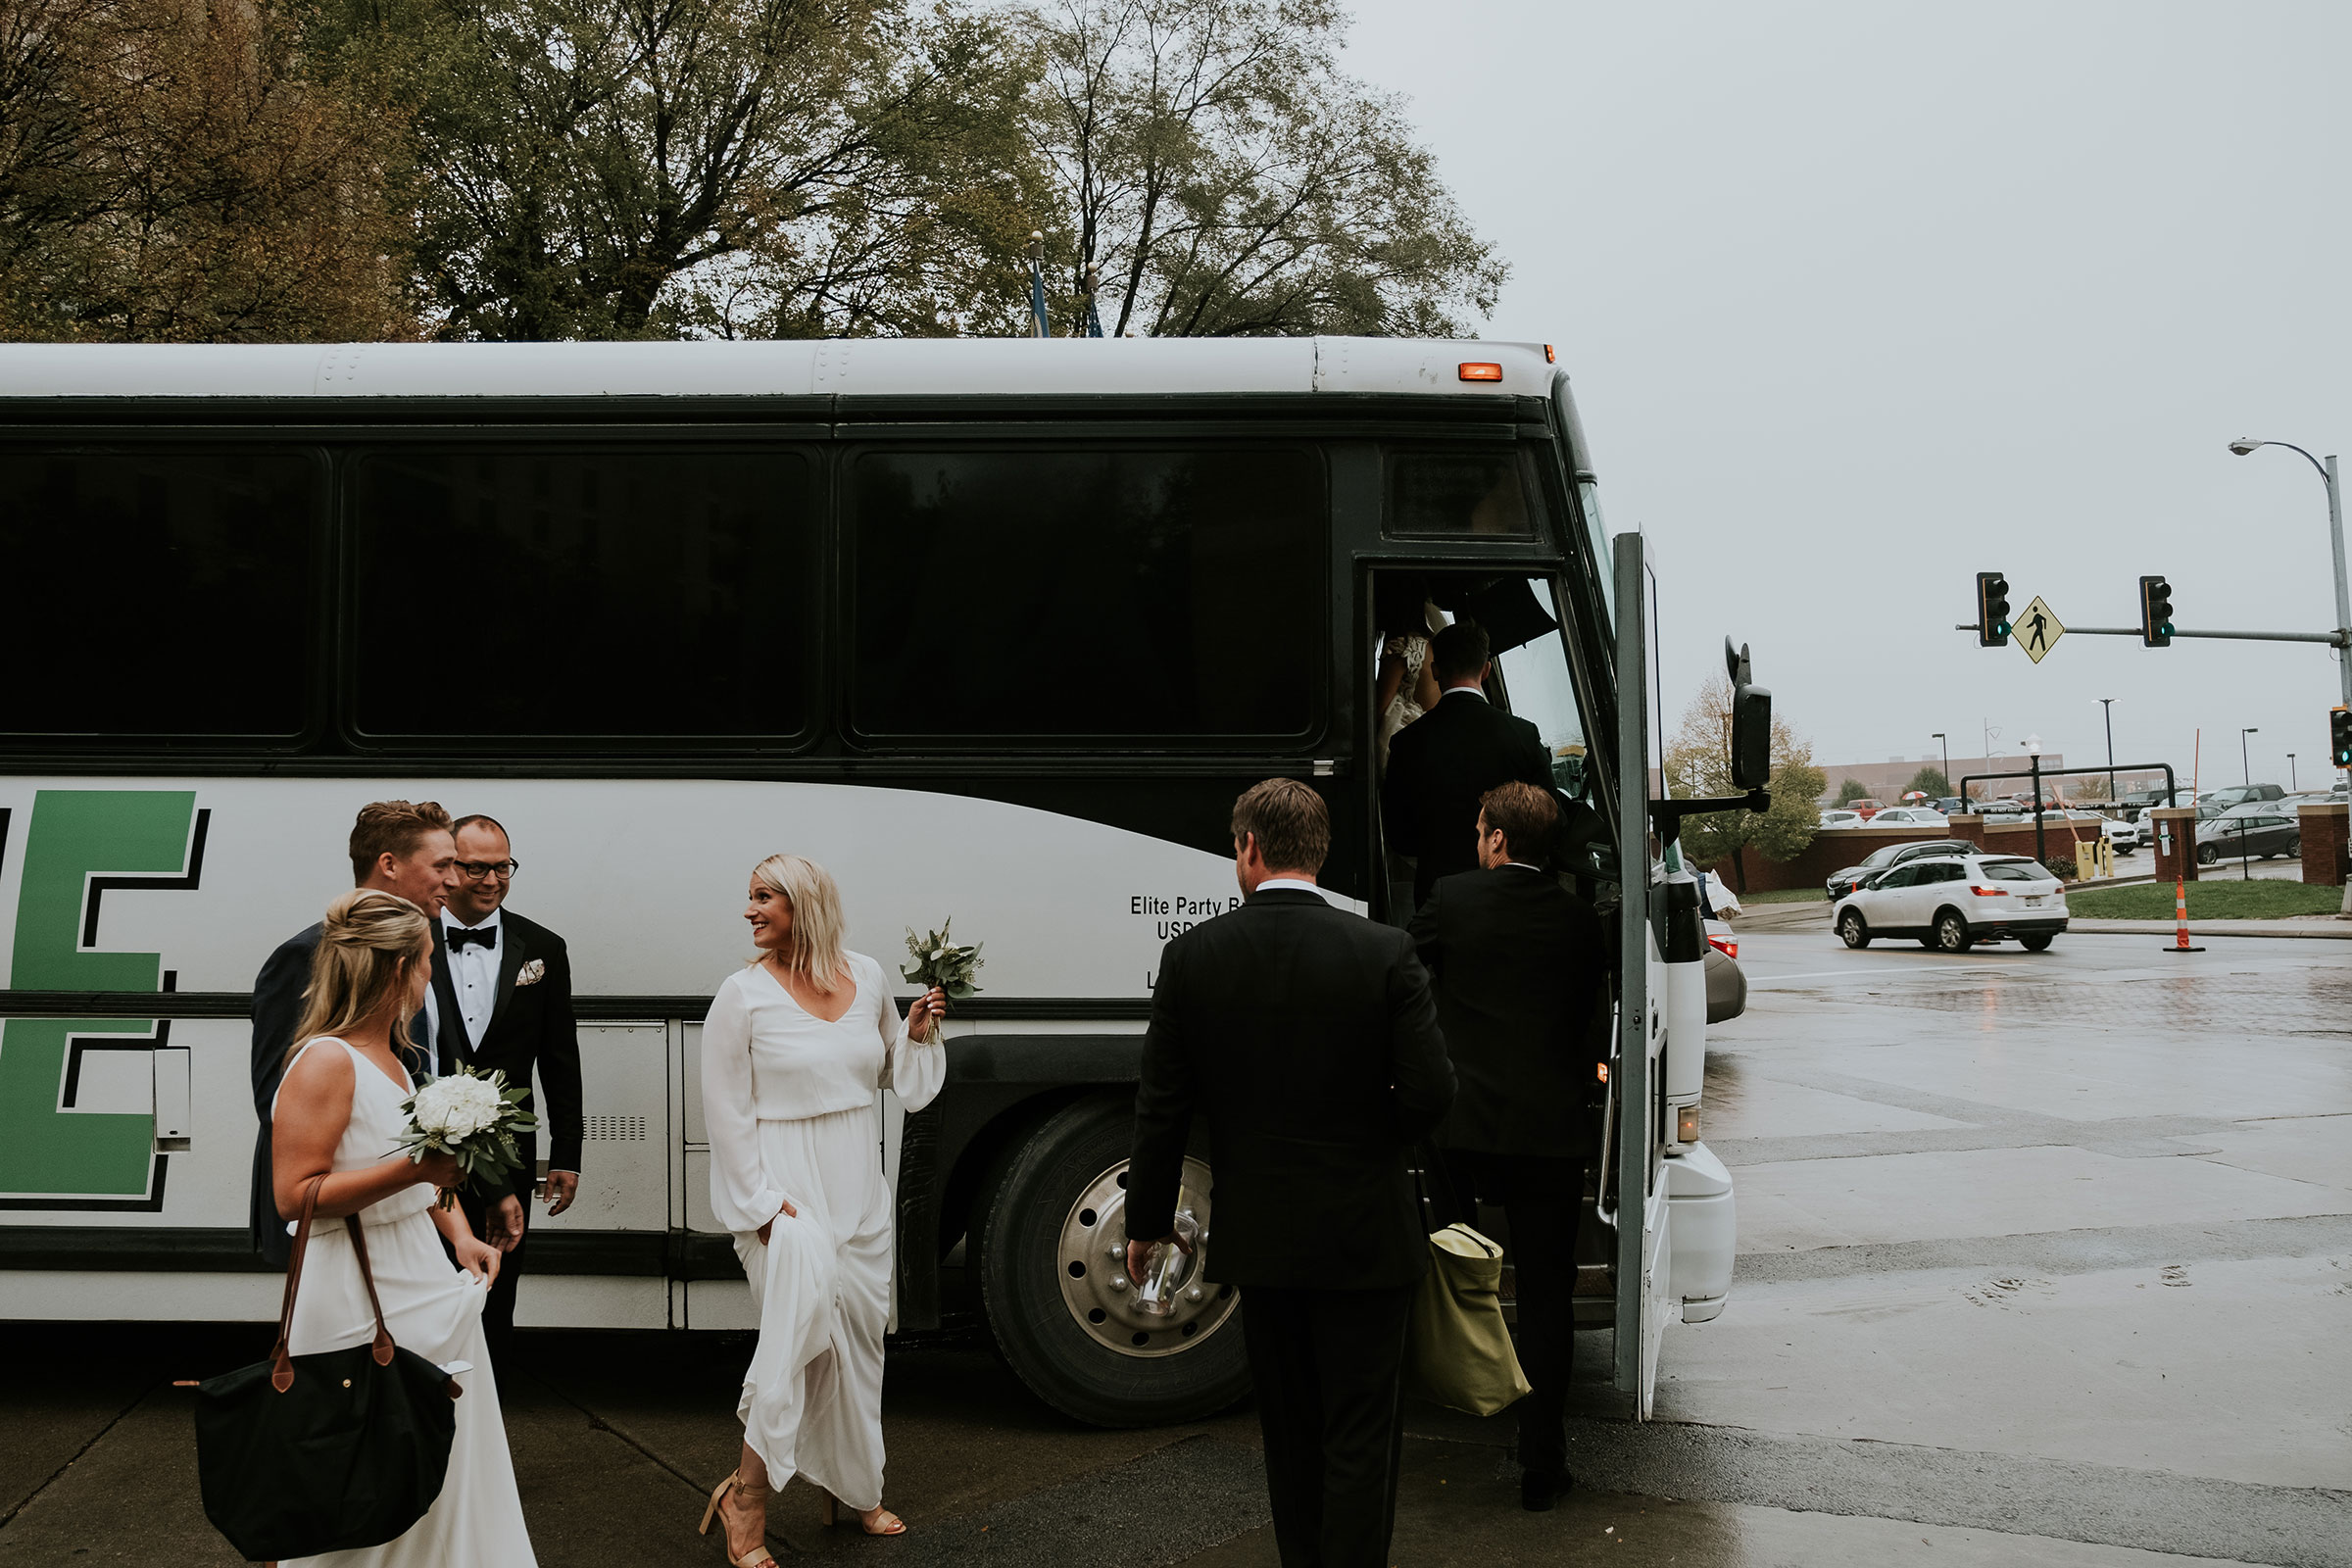 wedding-party-getting-on-party-bus-omaha-nebraska-raelyn-ramey-photography.jpg